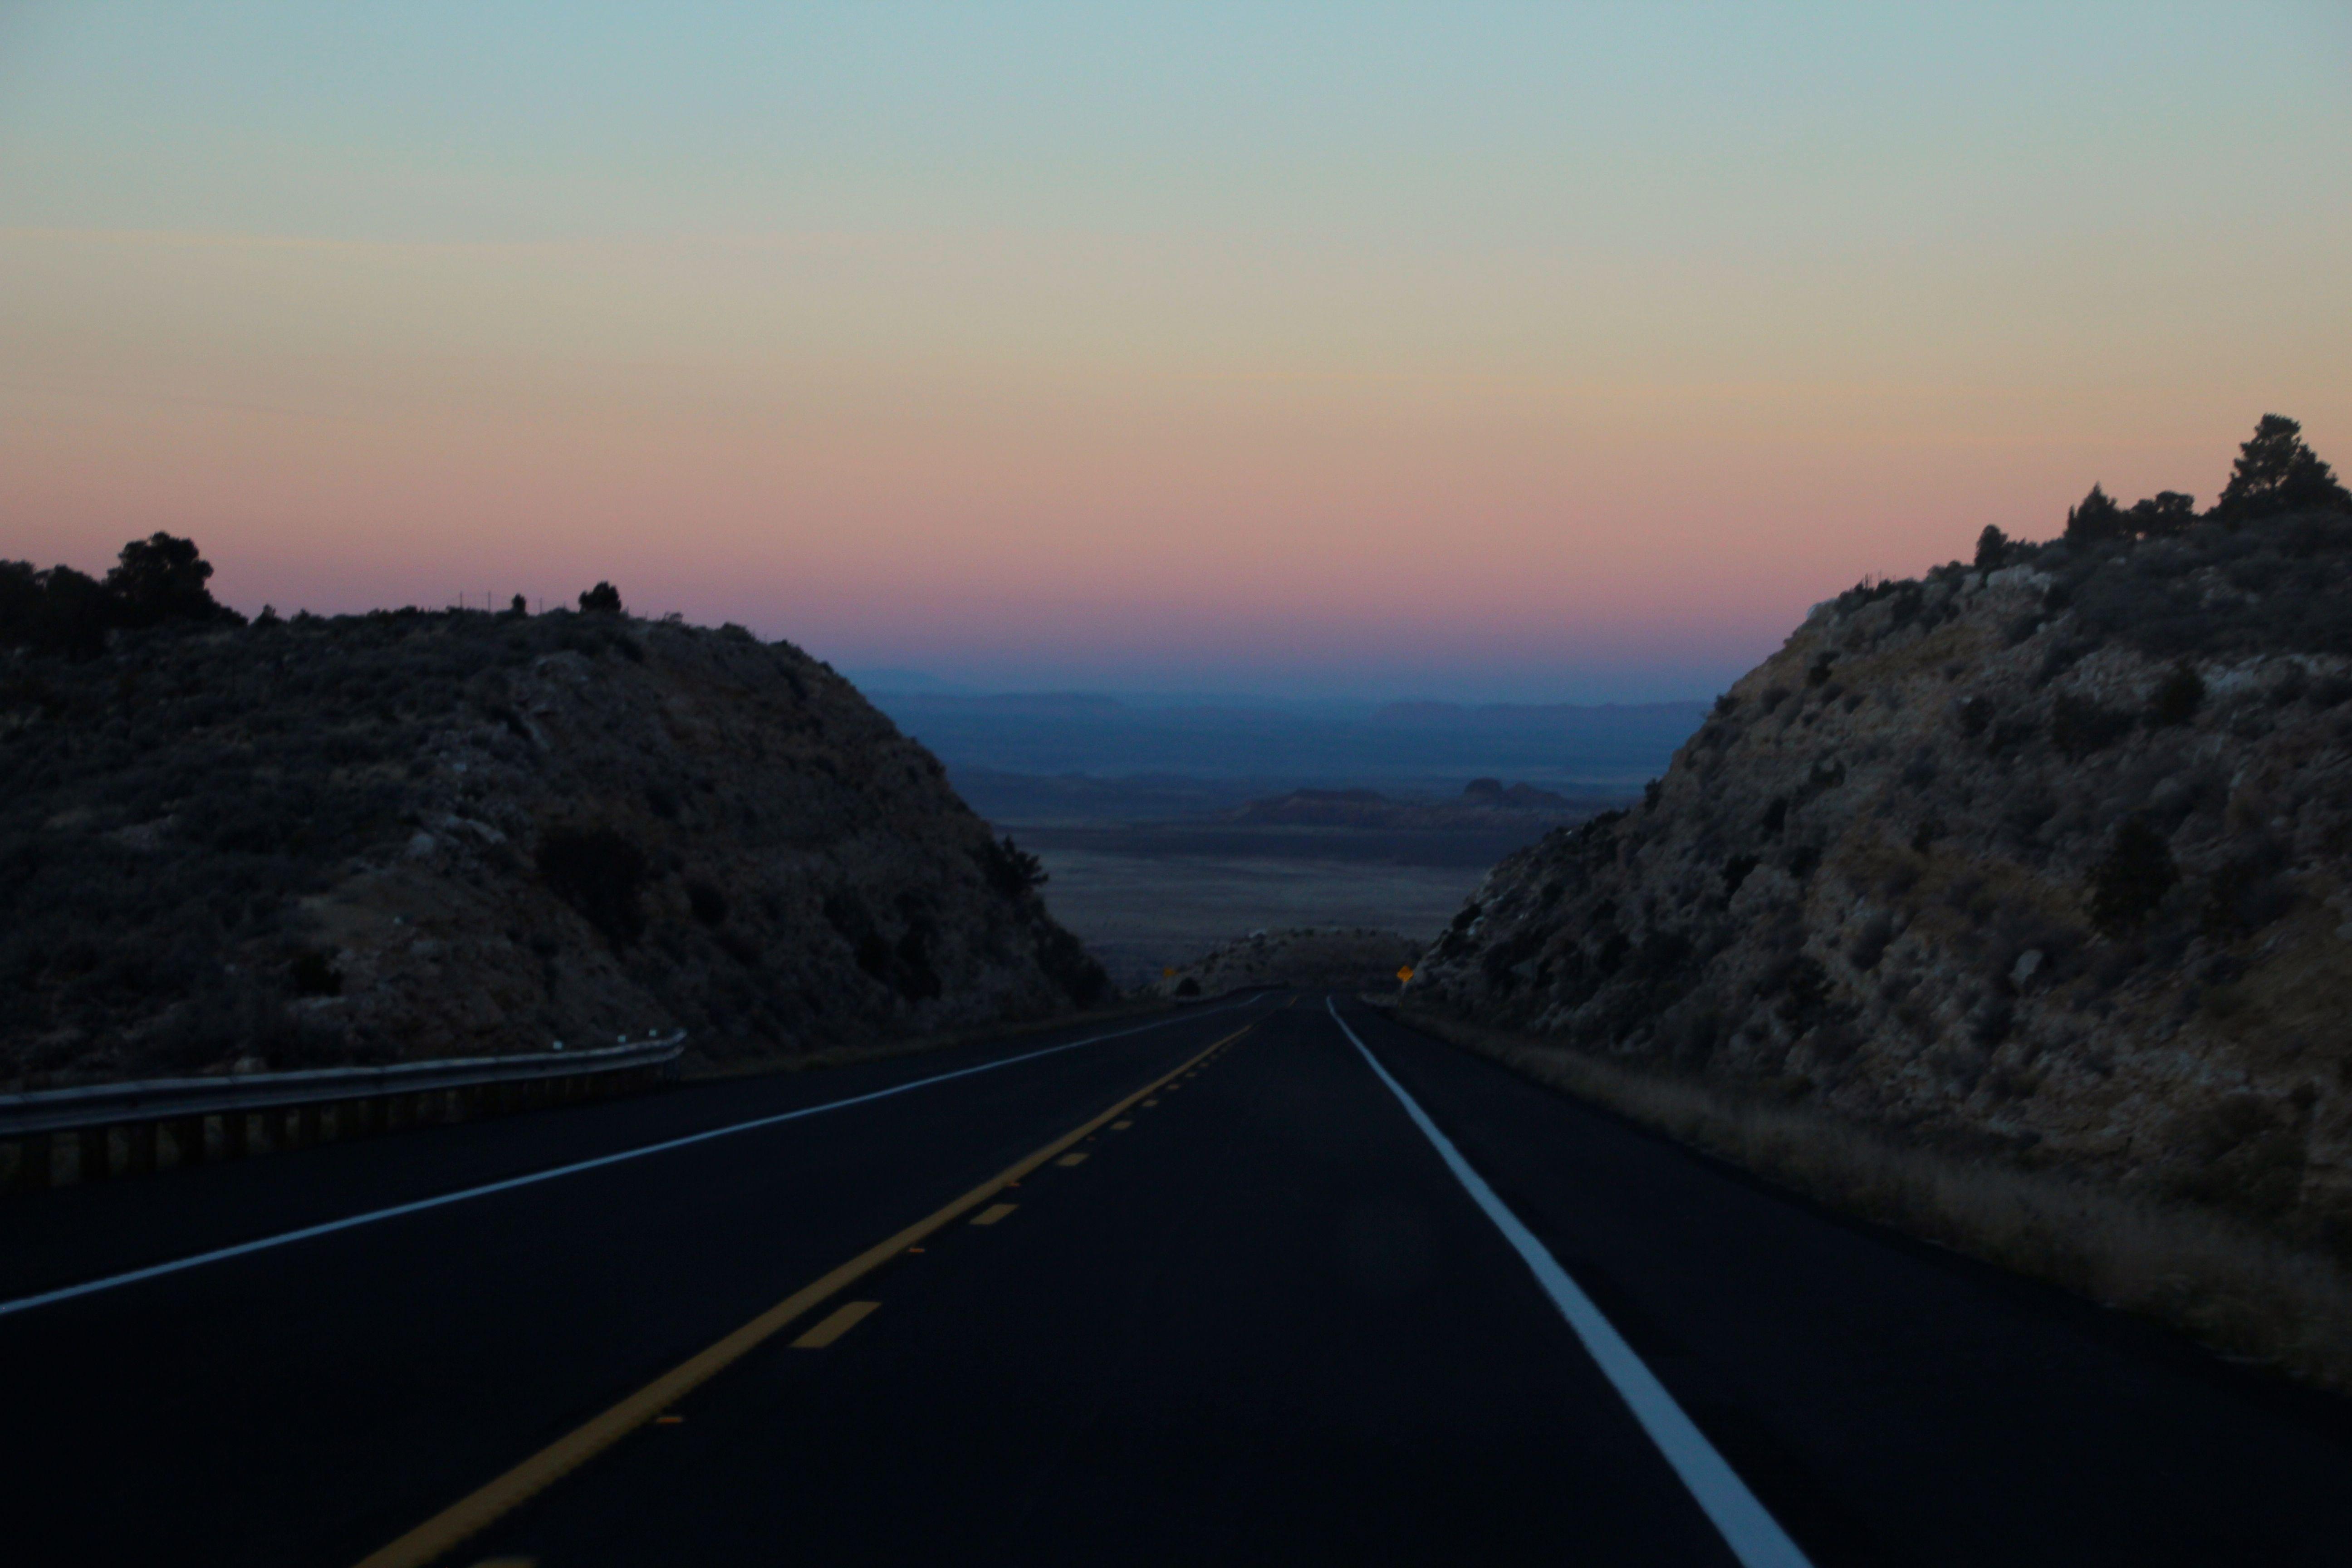 11 road trip sunset usa (c) upupup.fr